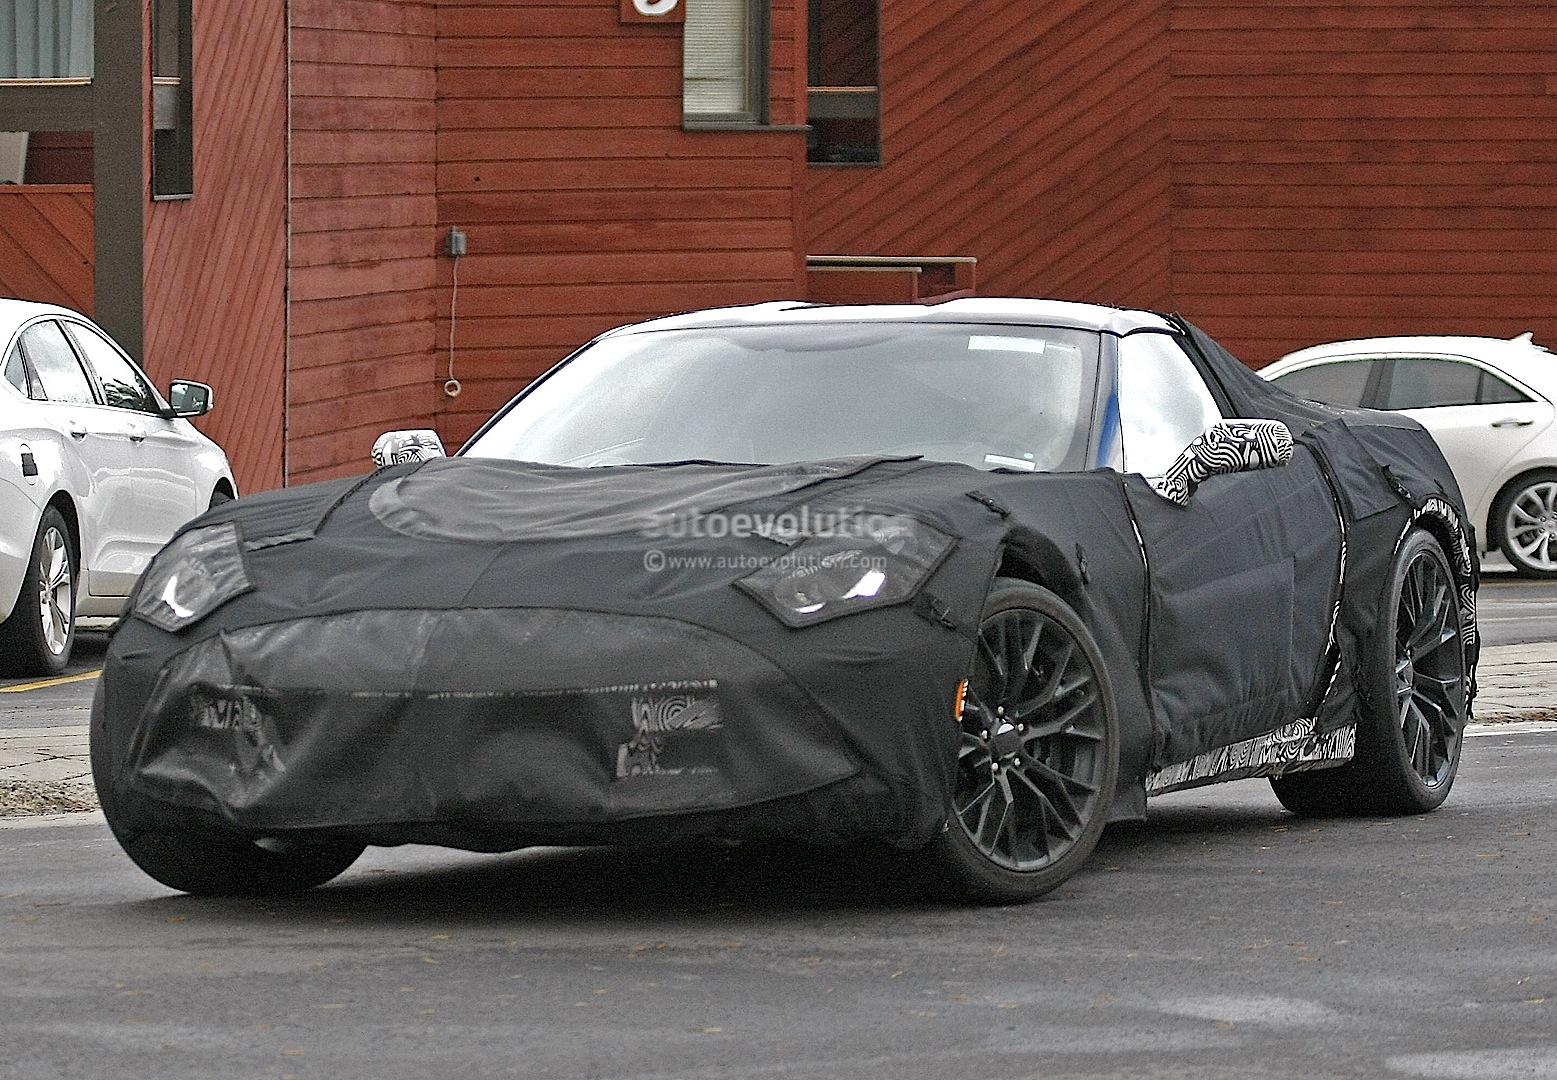 2015 chevrolet corvette z07 spyshots 2015 chevrolet corvette z07 spyshots